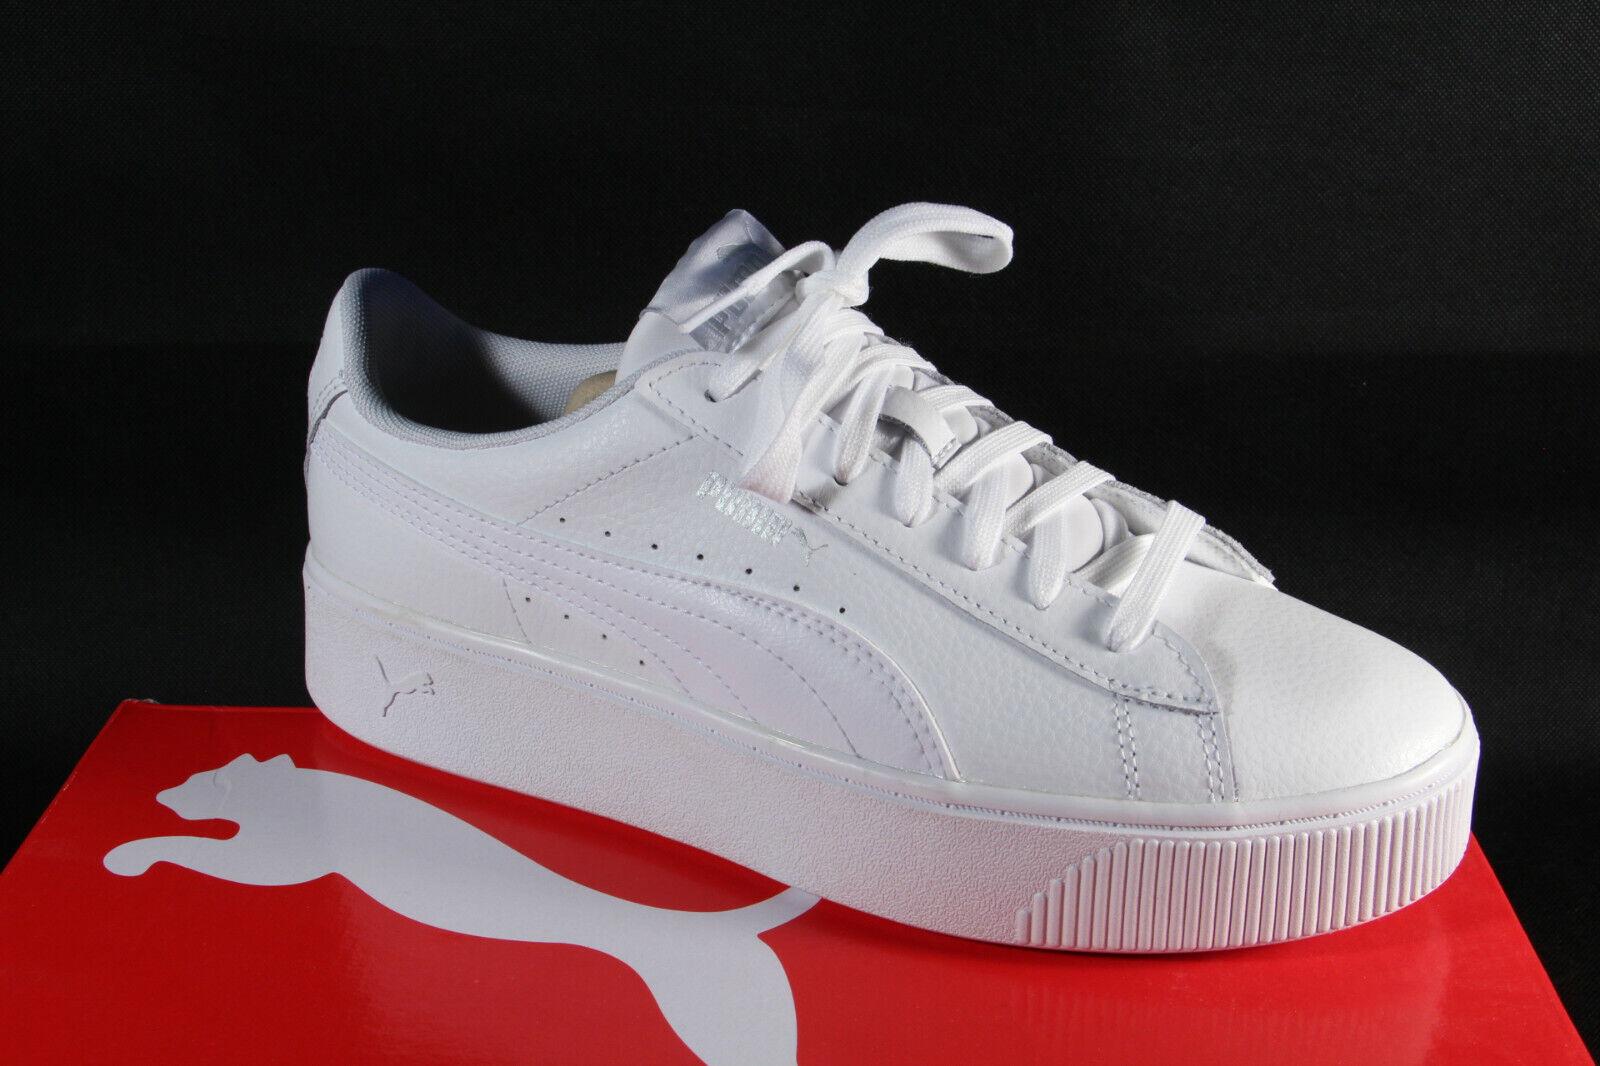 Puma Damen Schnürschuh Sneaker Slipper Sportschuh Halbschuh weiß 369143 Neu!